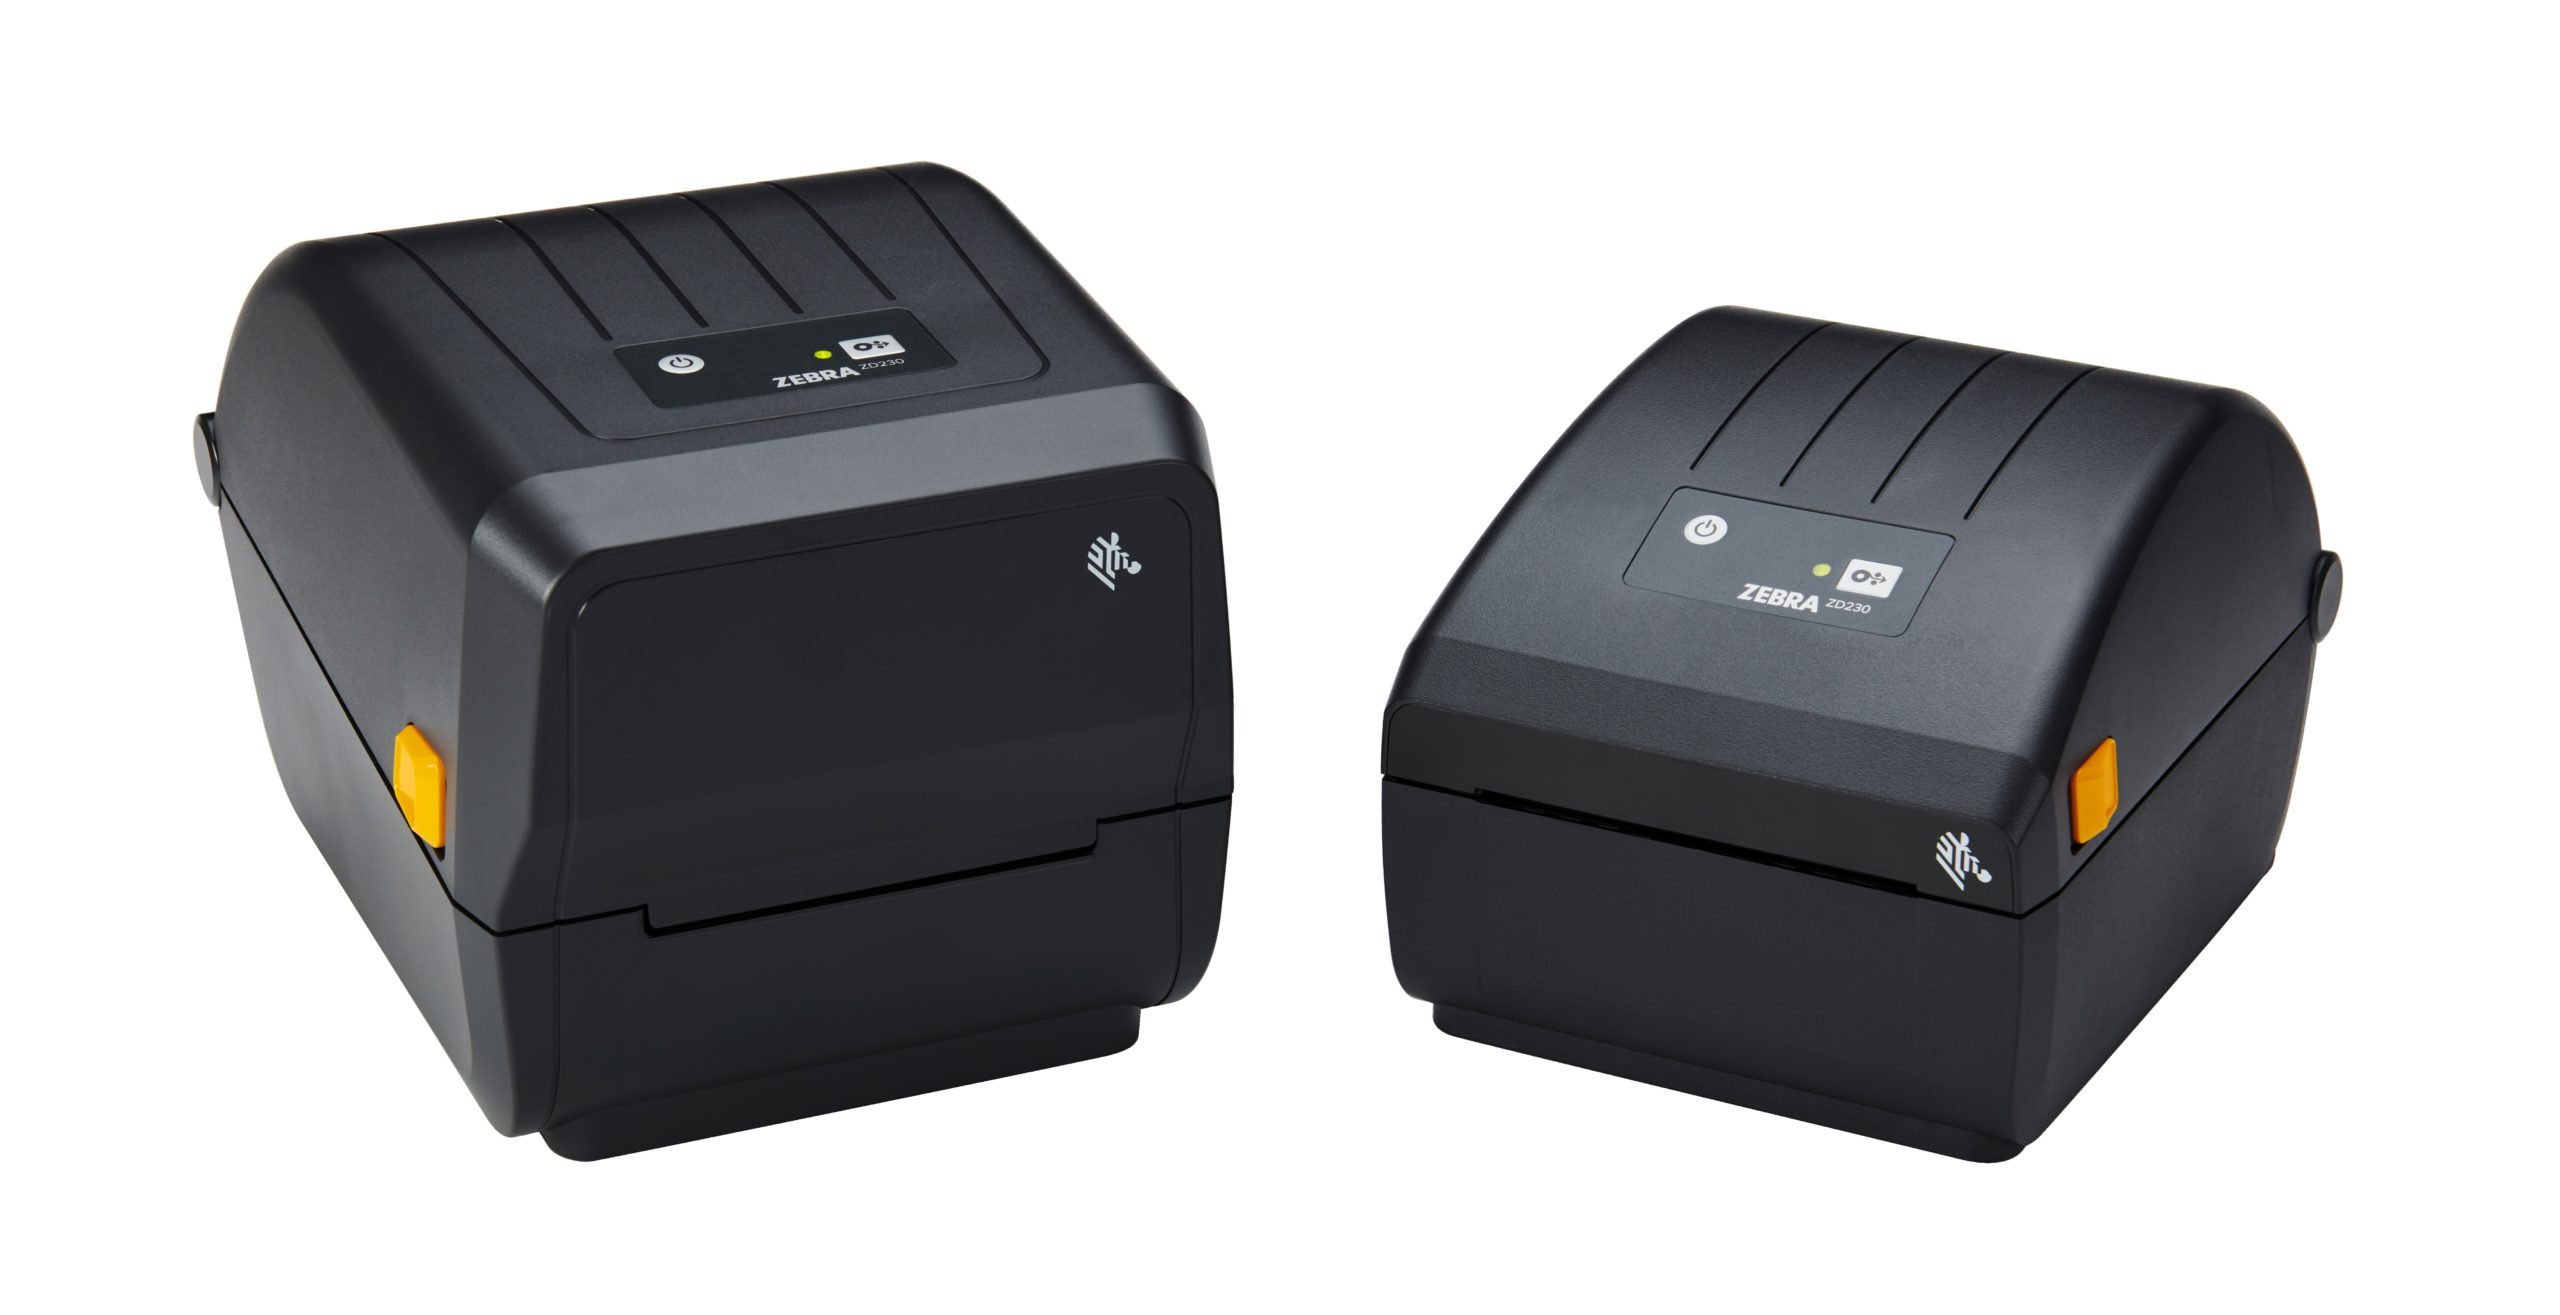 ZD200 Series Zebra Desktop Printers